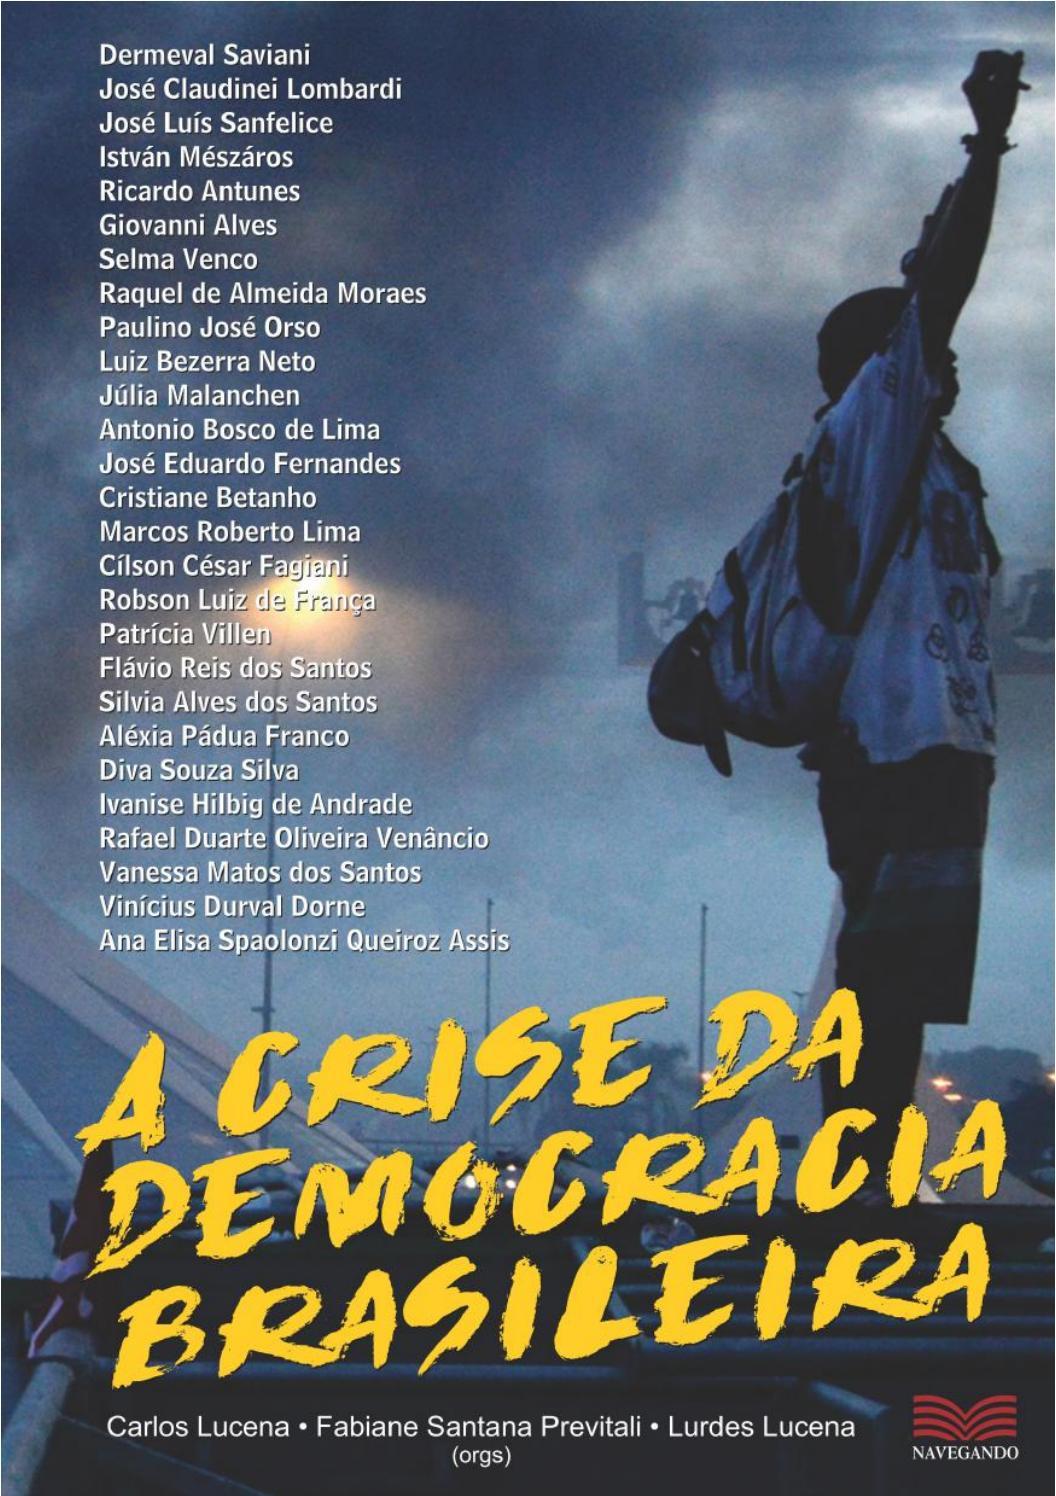 3469f21f5b0 A CRISE DA DEMOCRACIA BRASILEIRA by Carlos Lucena - issuu